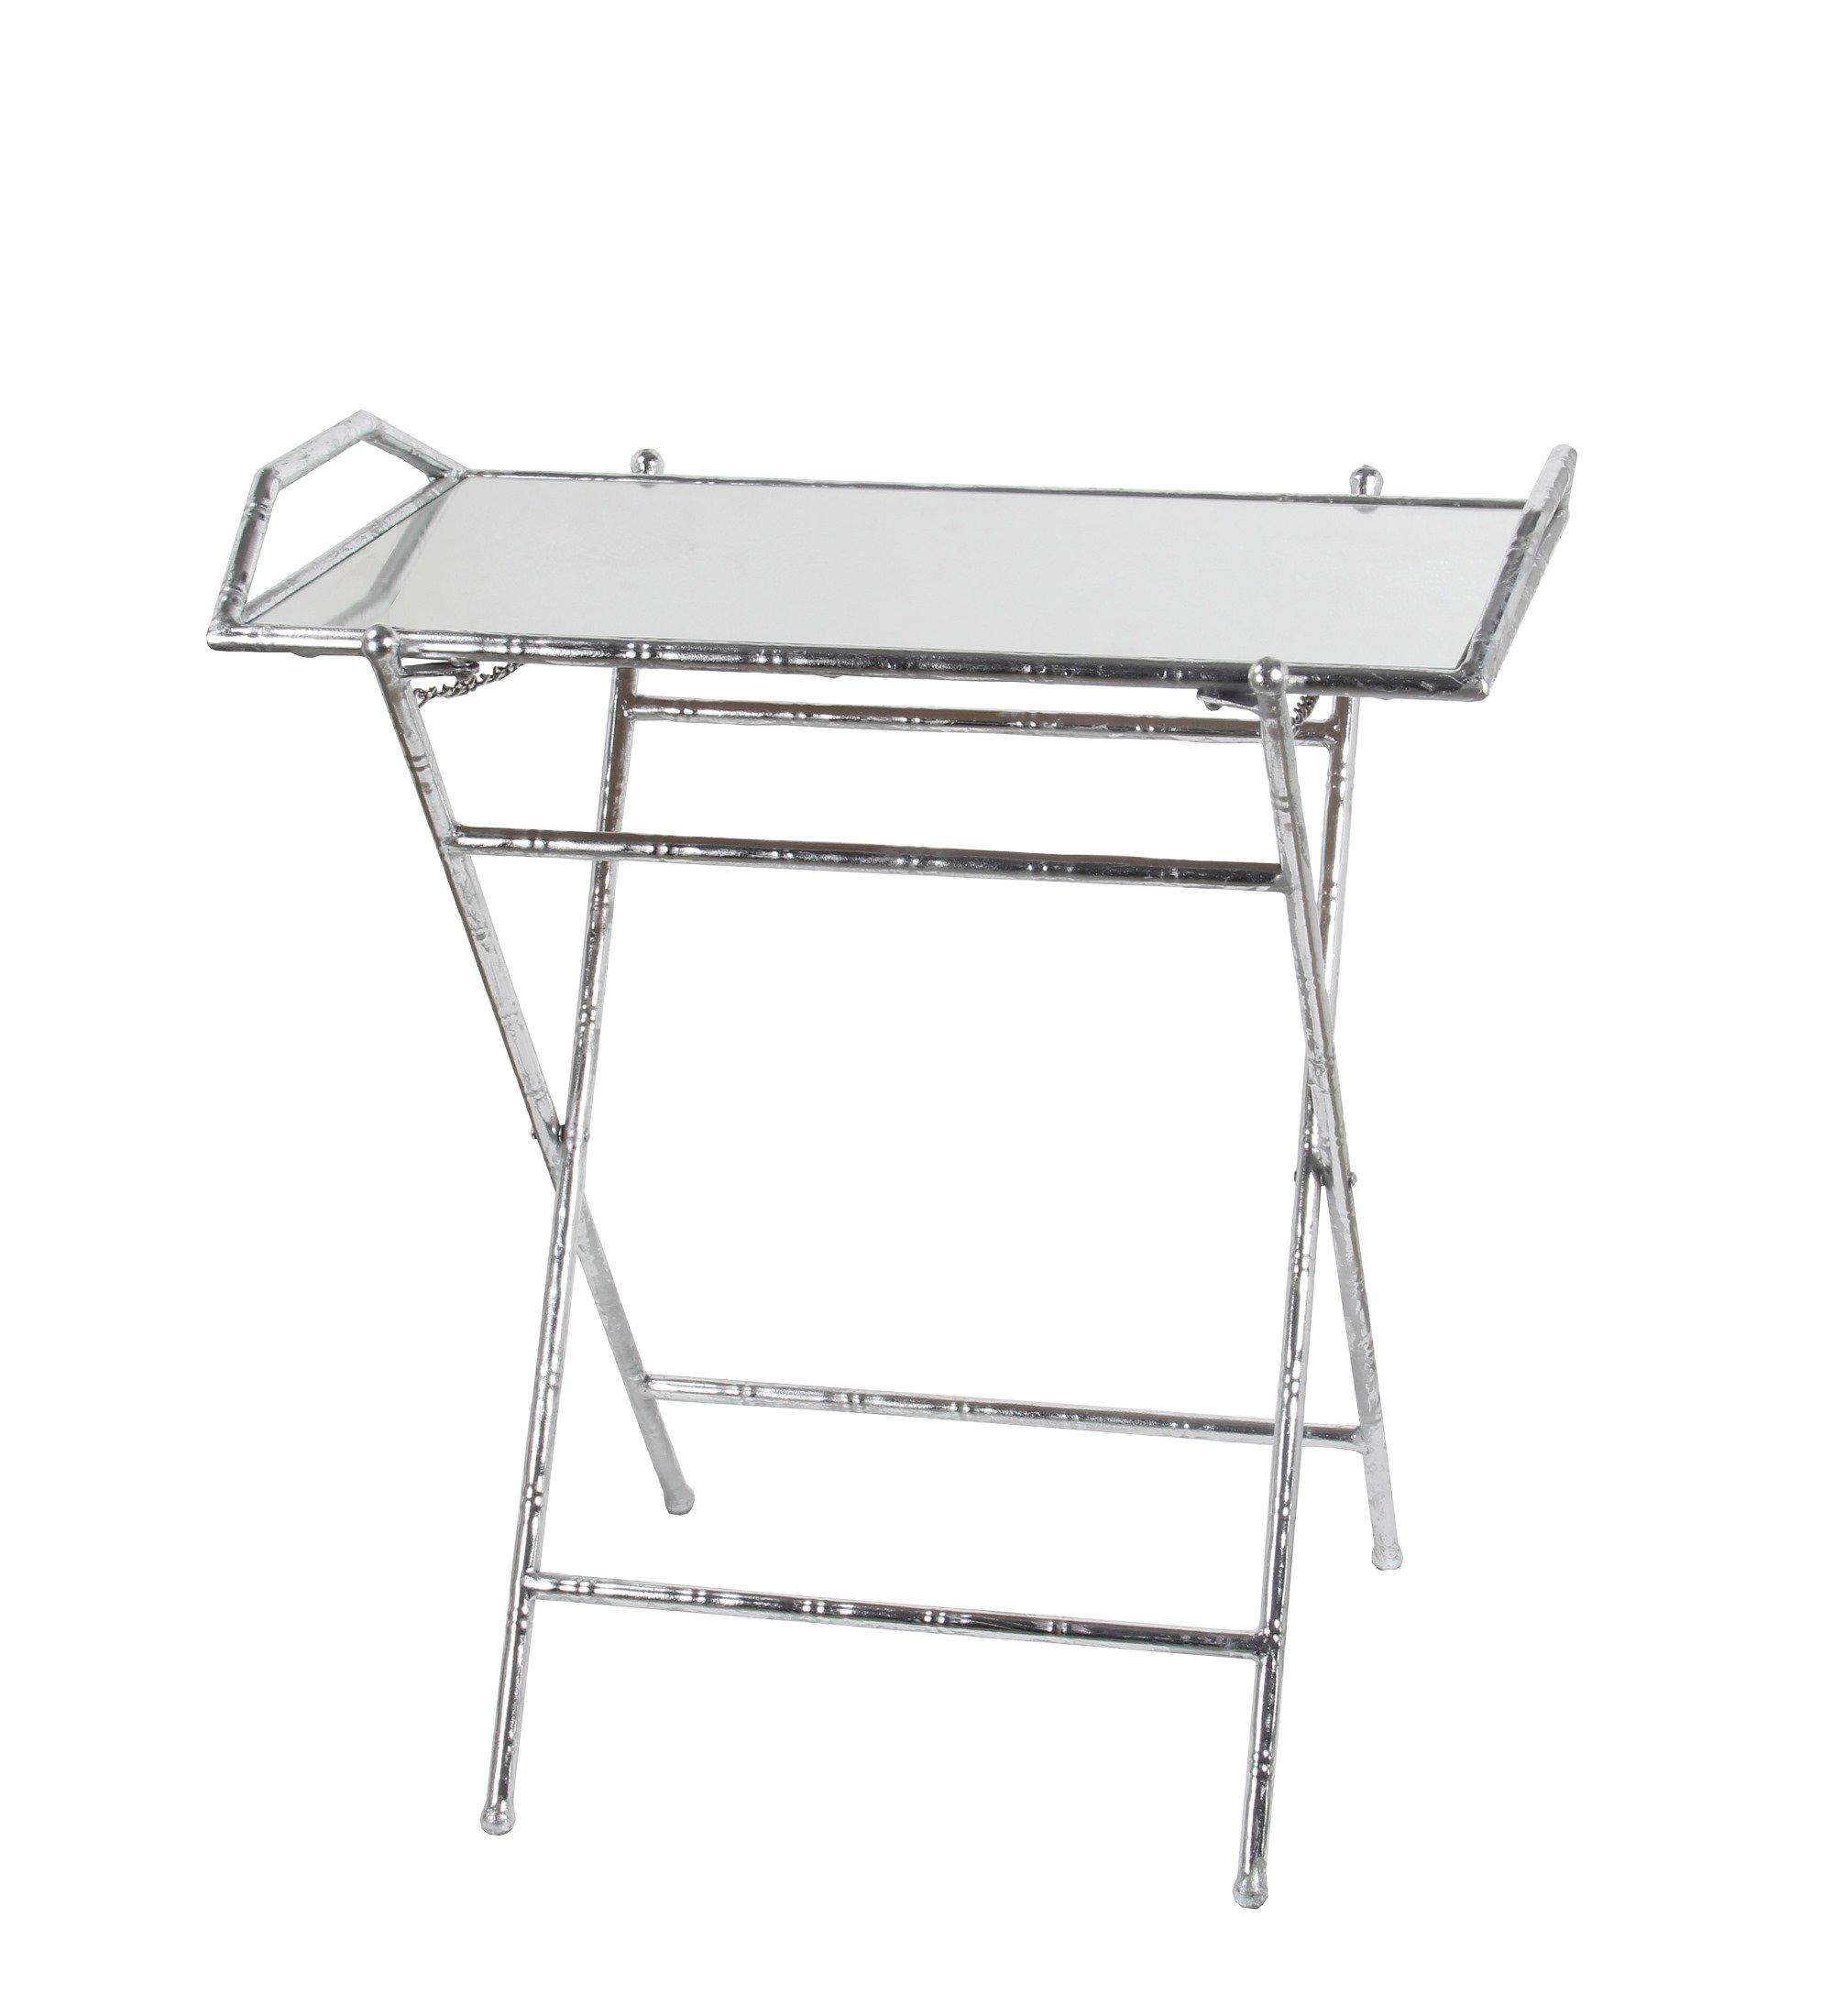 Privilege 18952 Folding Tray Leaf Table, Silver